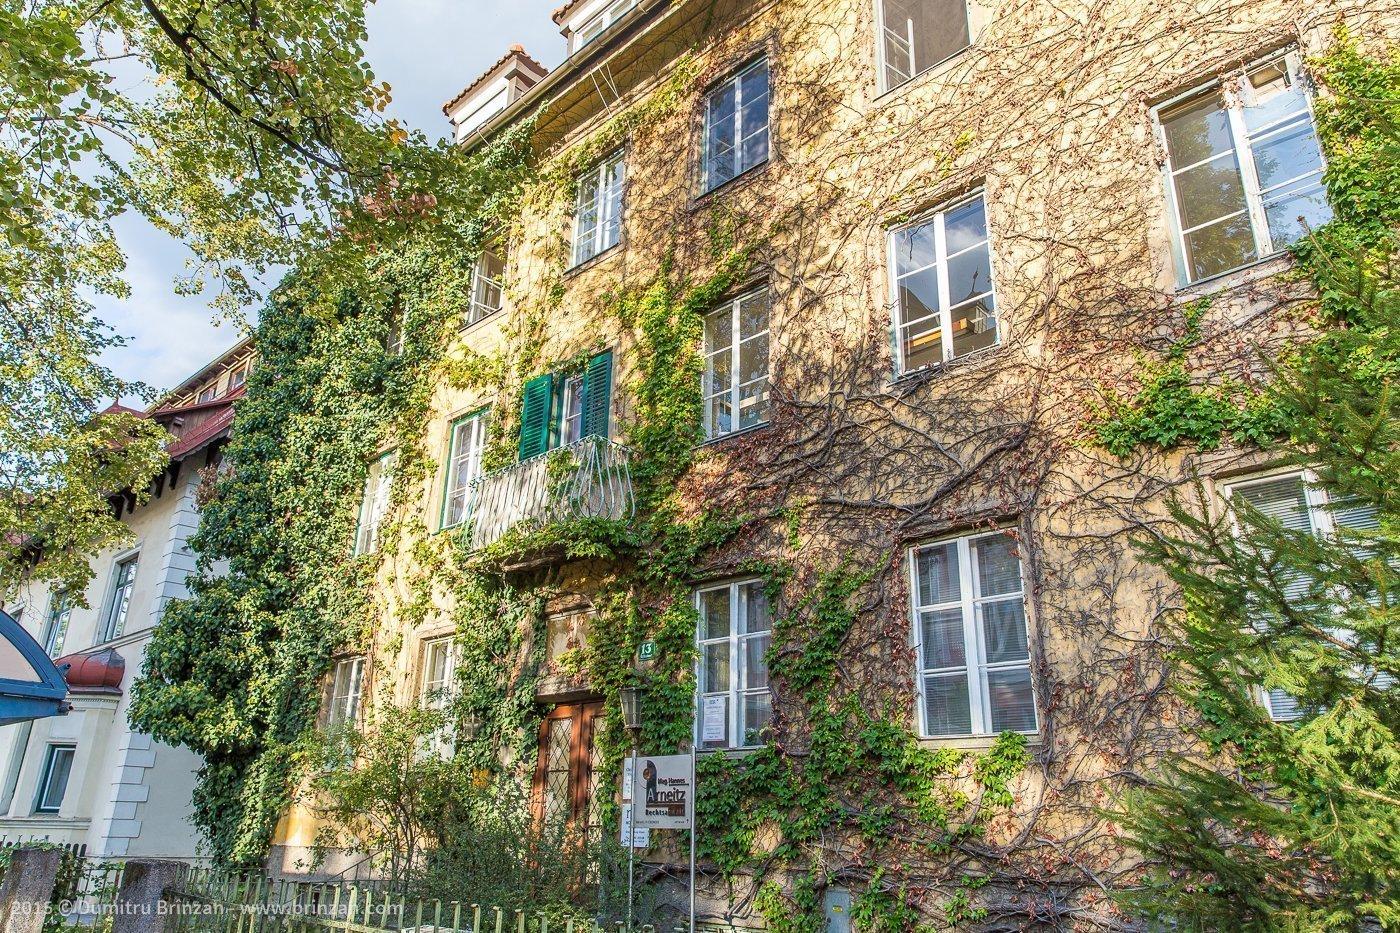 2015-september-villach-austria-18